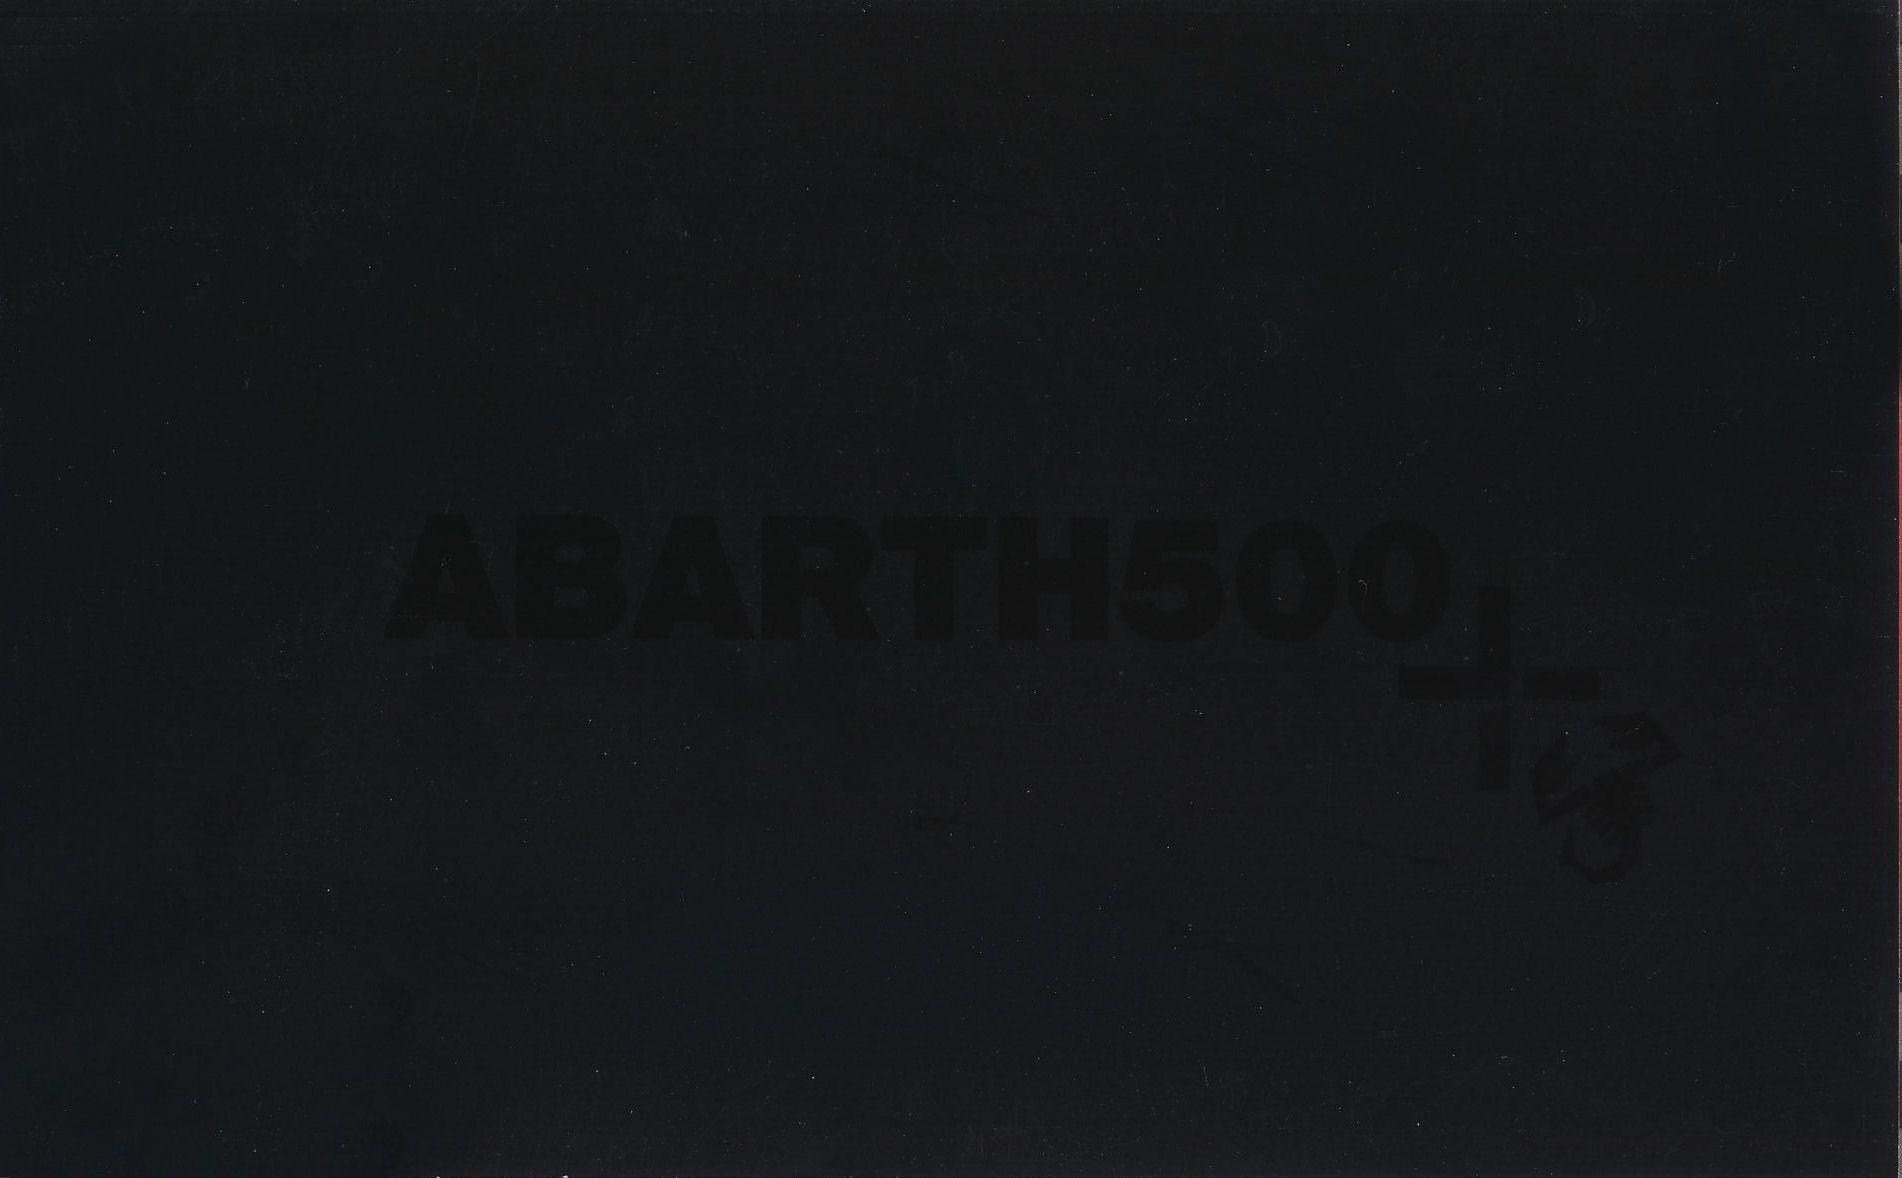 2009 Abarth 500 Brochure